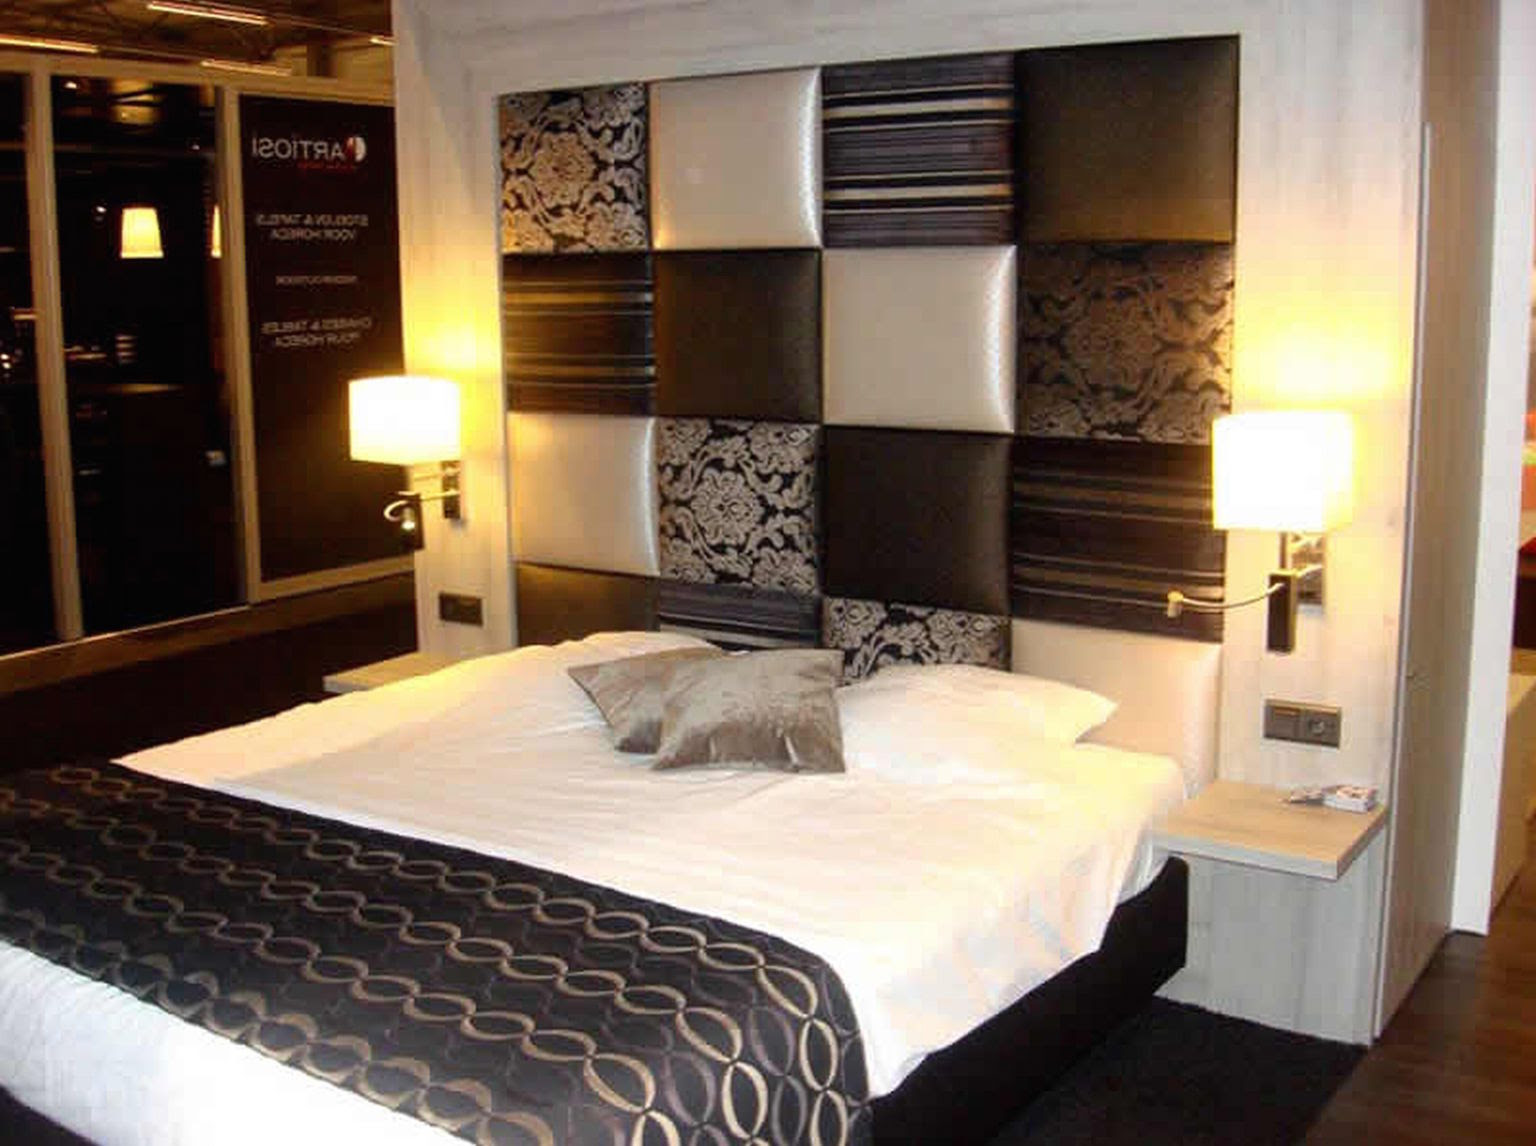 cheap interior design ideas bedroom as art deco interior design for fascinating Bedroom tips and trick 129